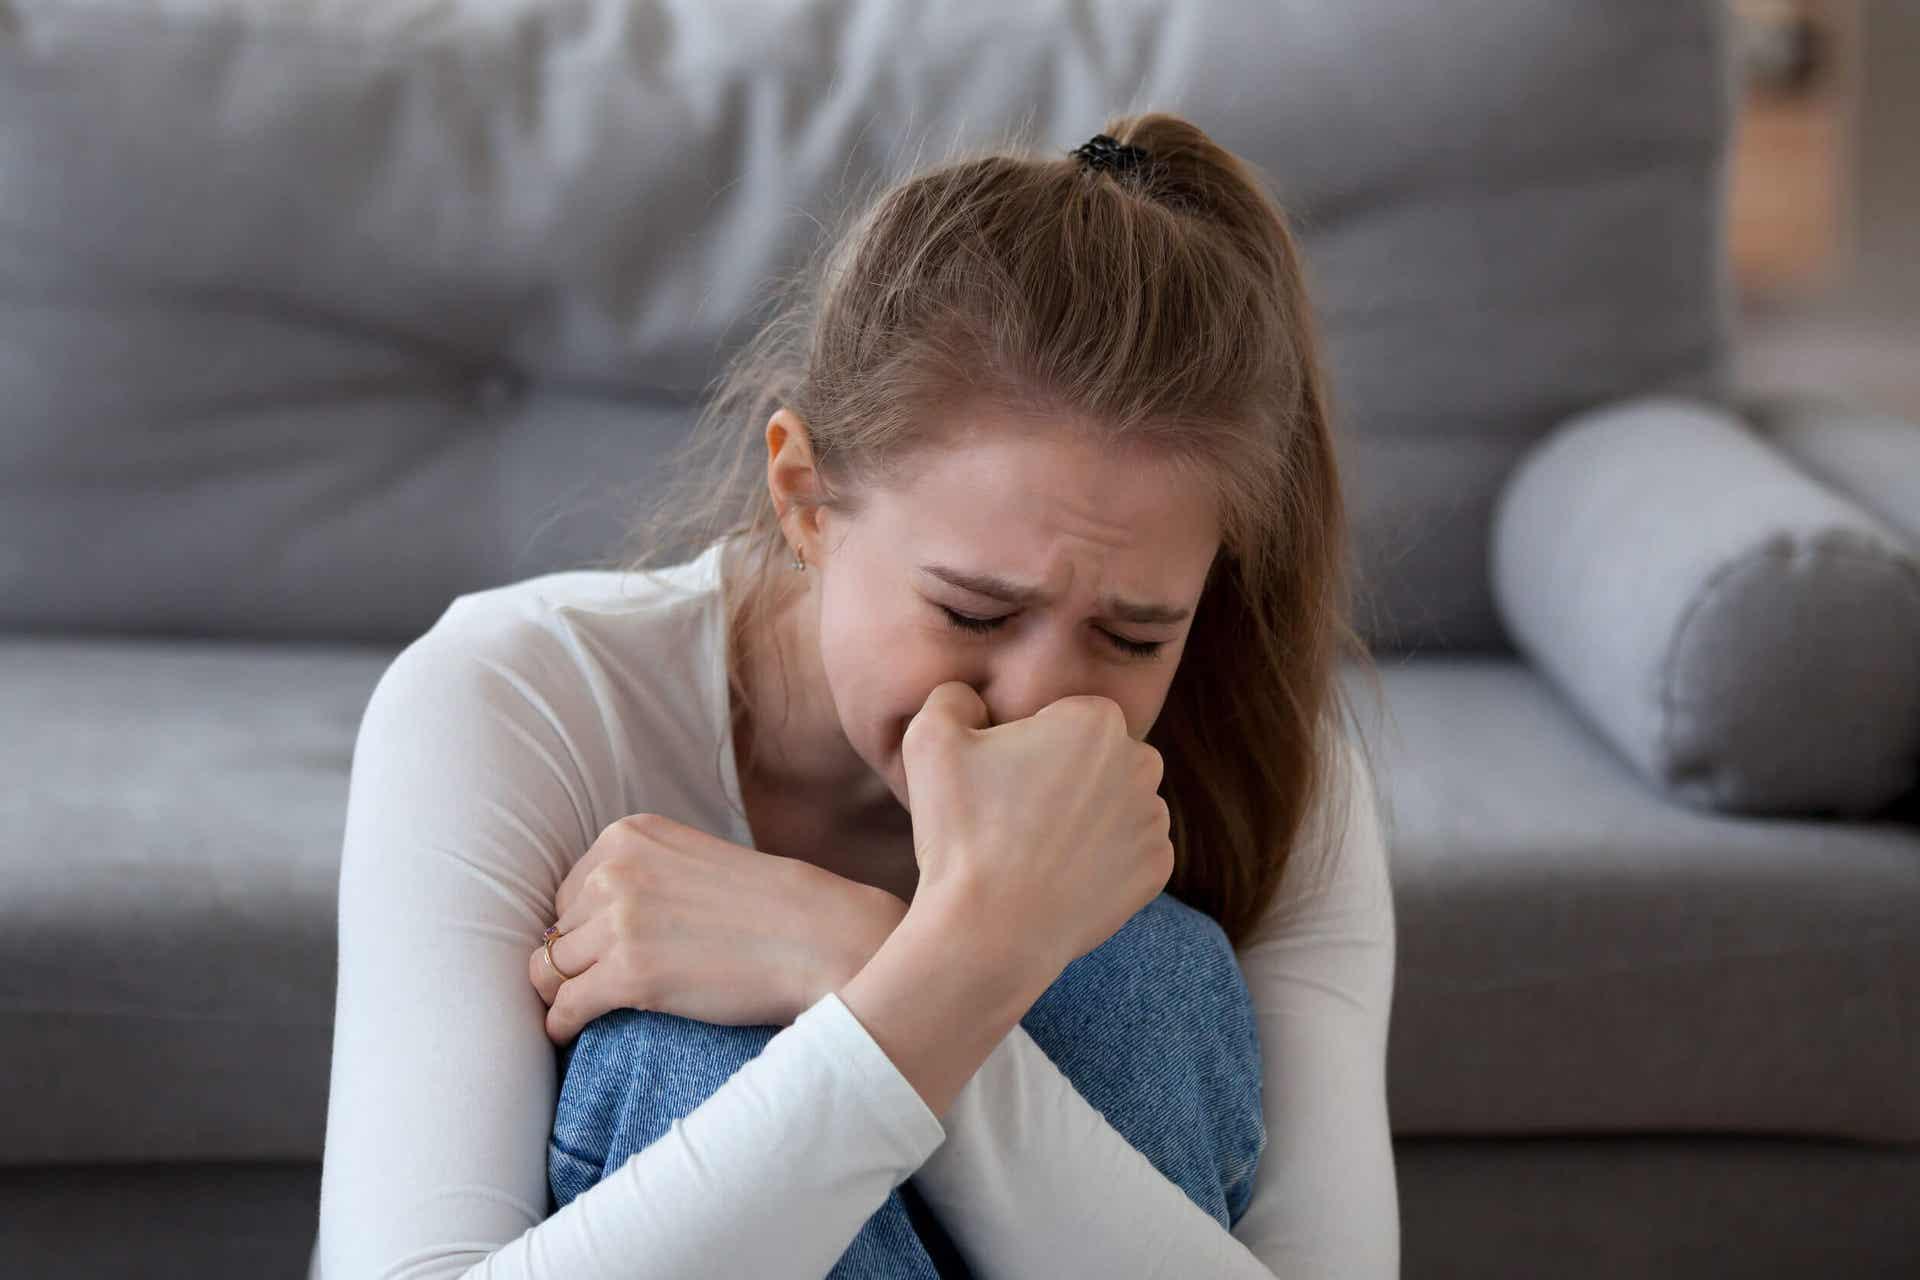 oturmuş ağlayan kadın